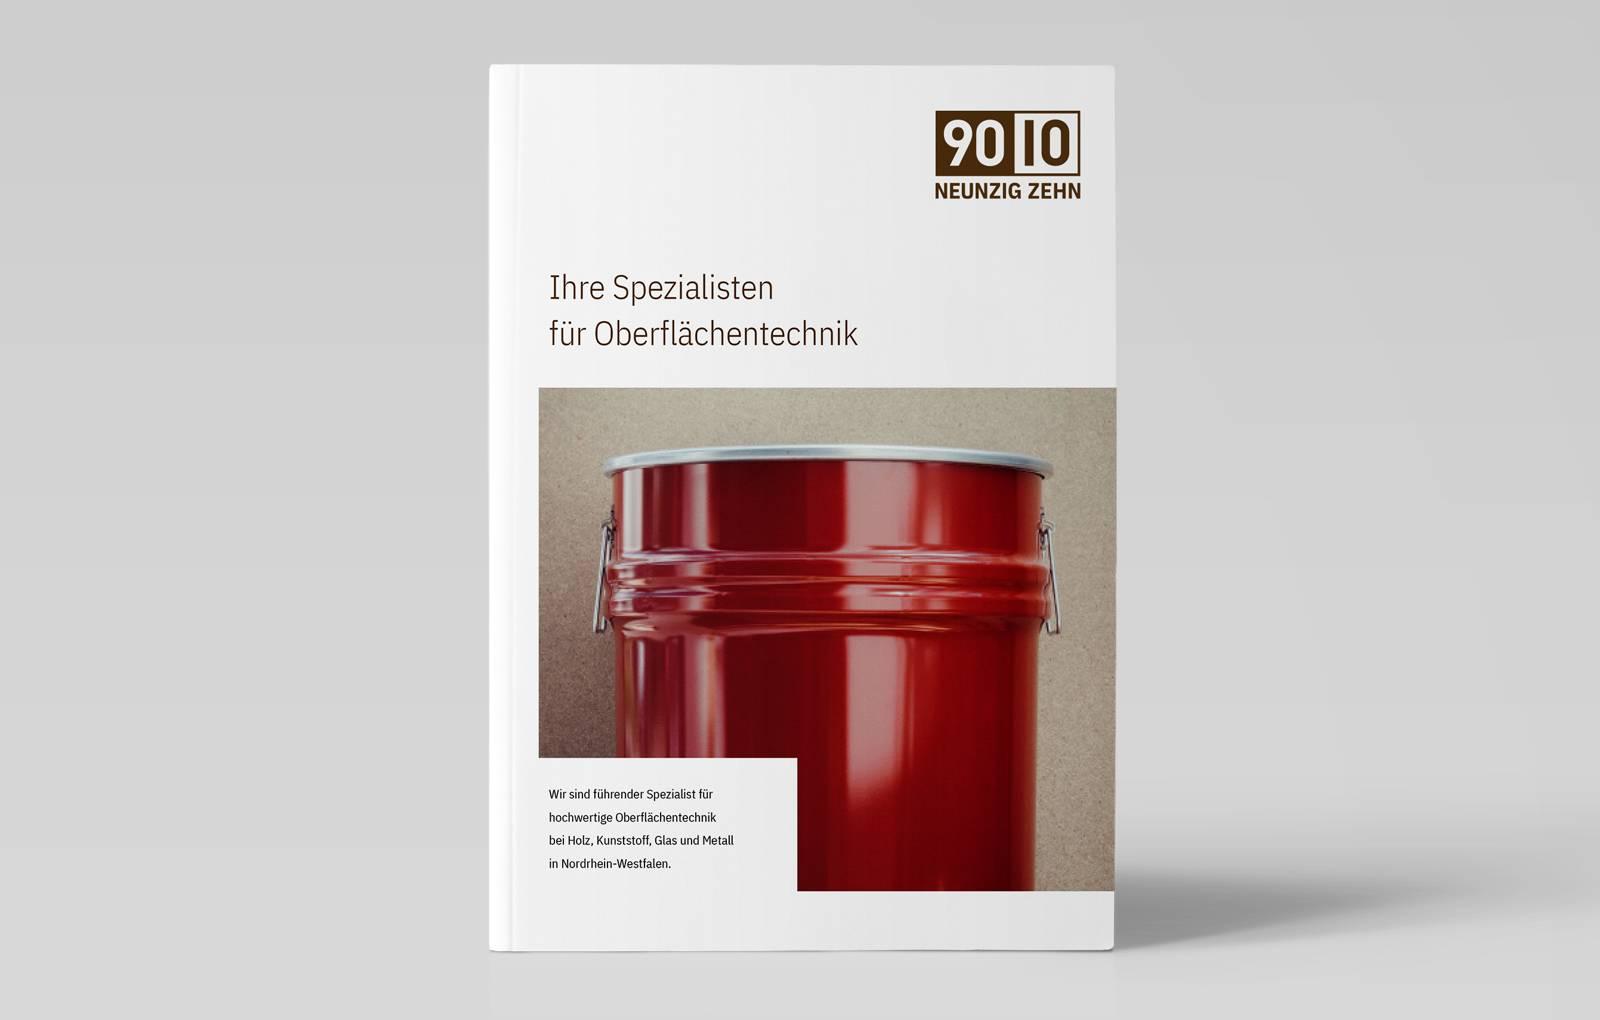 Image-Broschüre 90.10 Cover